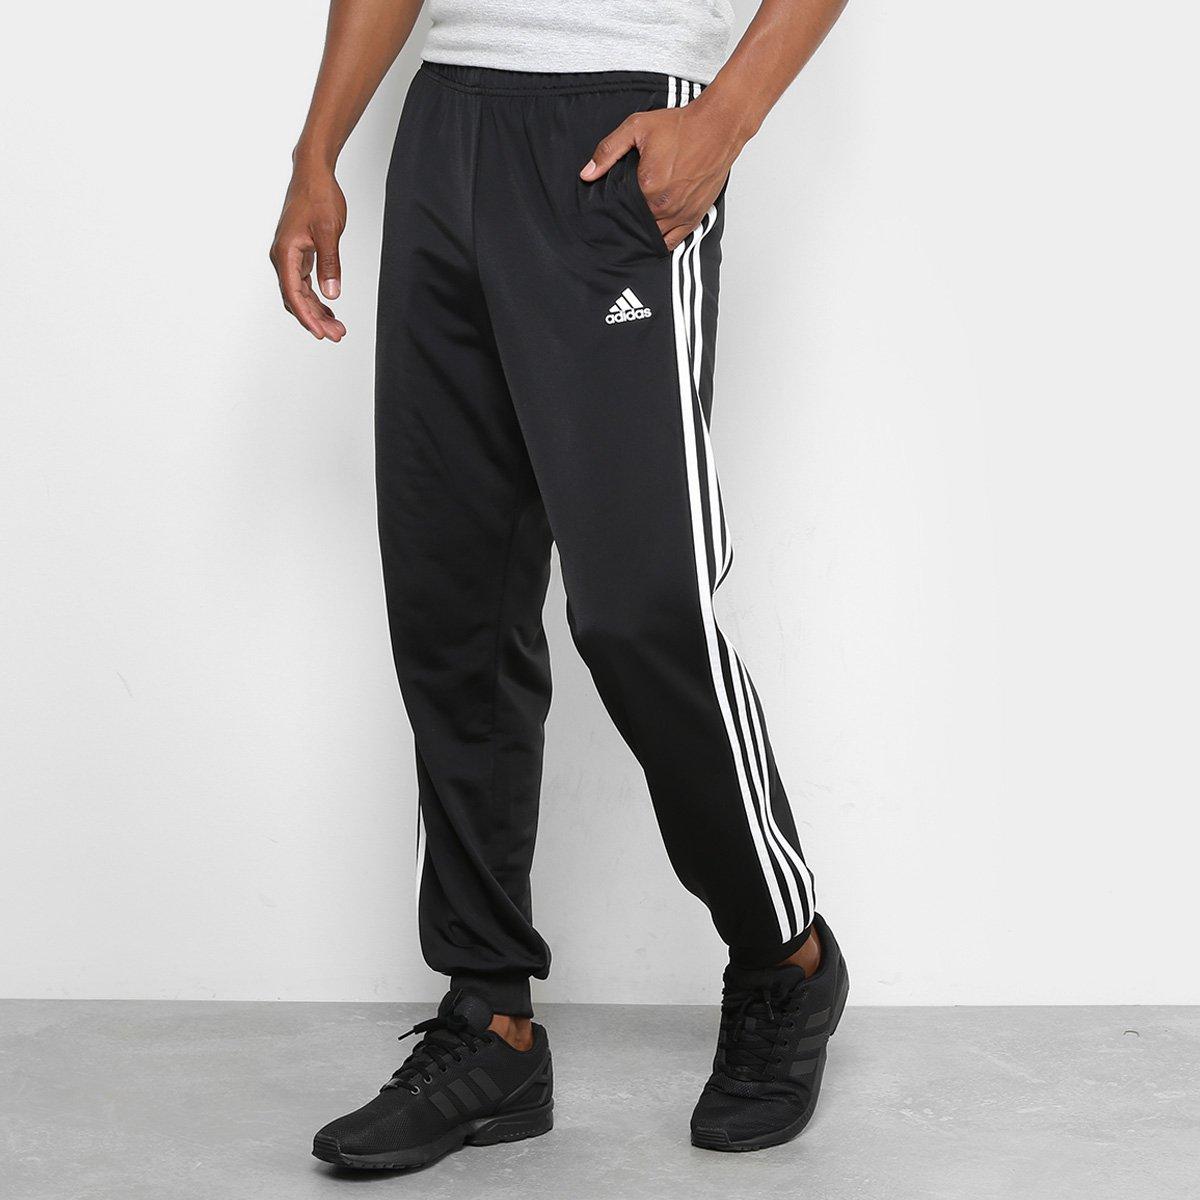 ebab86b533fff Calça Adidas ESS 3S T Tricot Masculina - Compre Agora